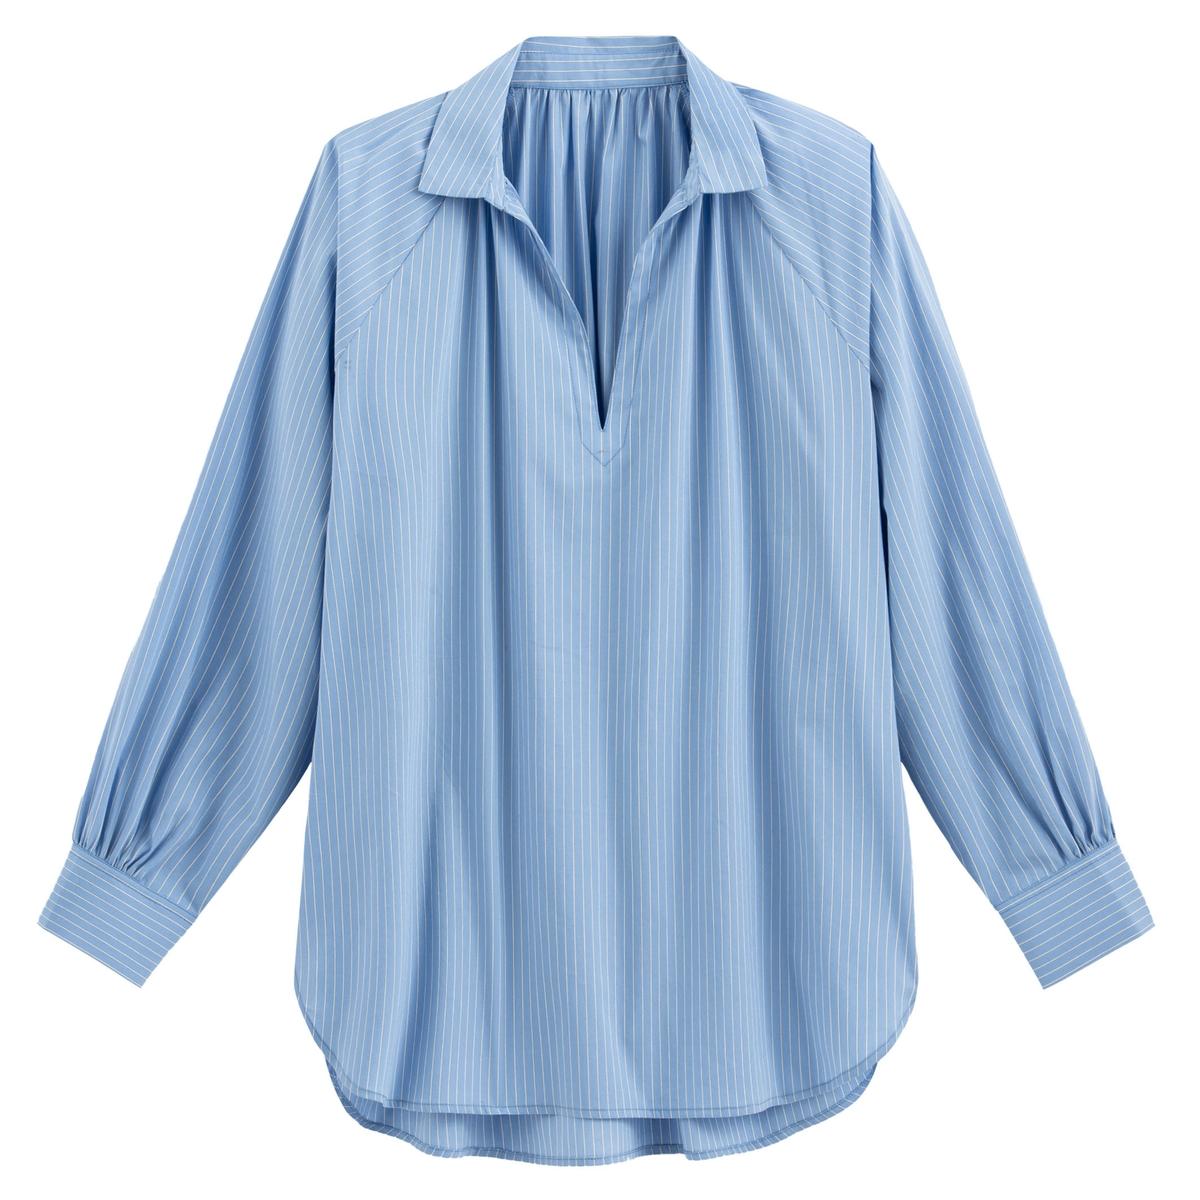 Blusa túnica amplia a rayas, de manga larga